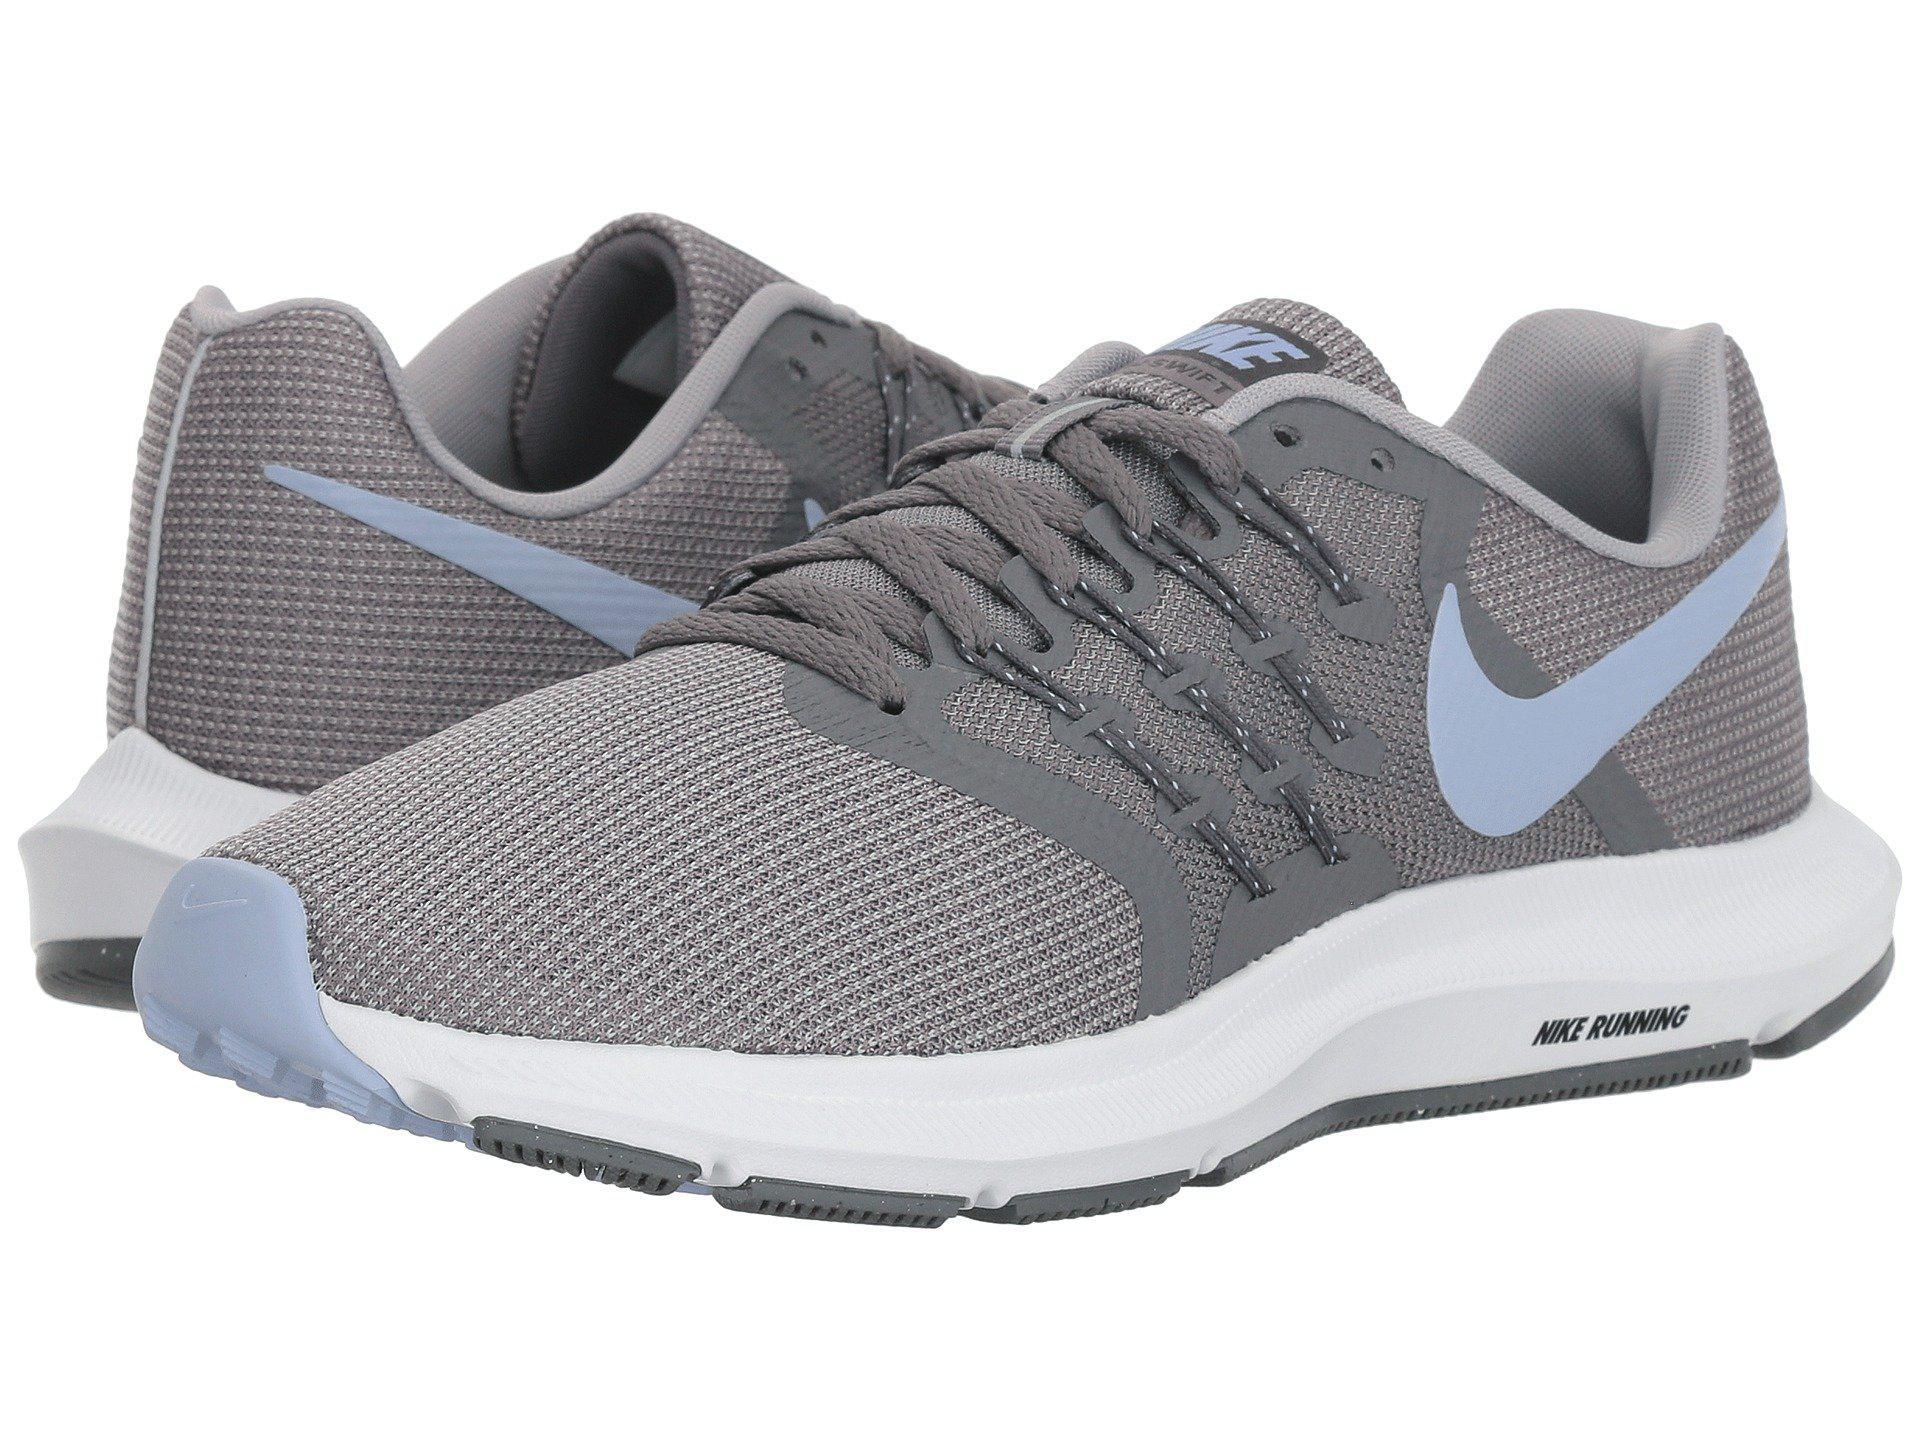 609fc466c6ce9 Lyst - Nike Run Swift in Gray